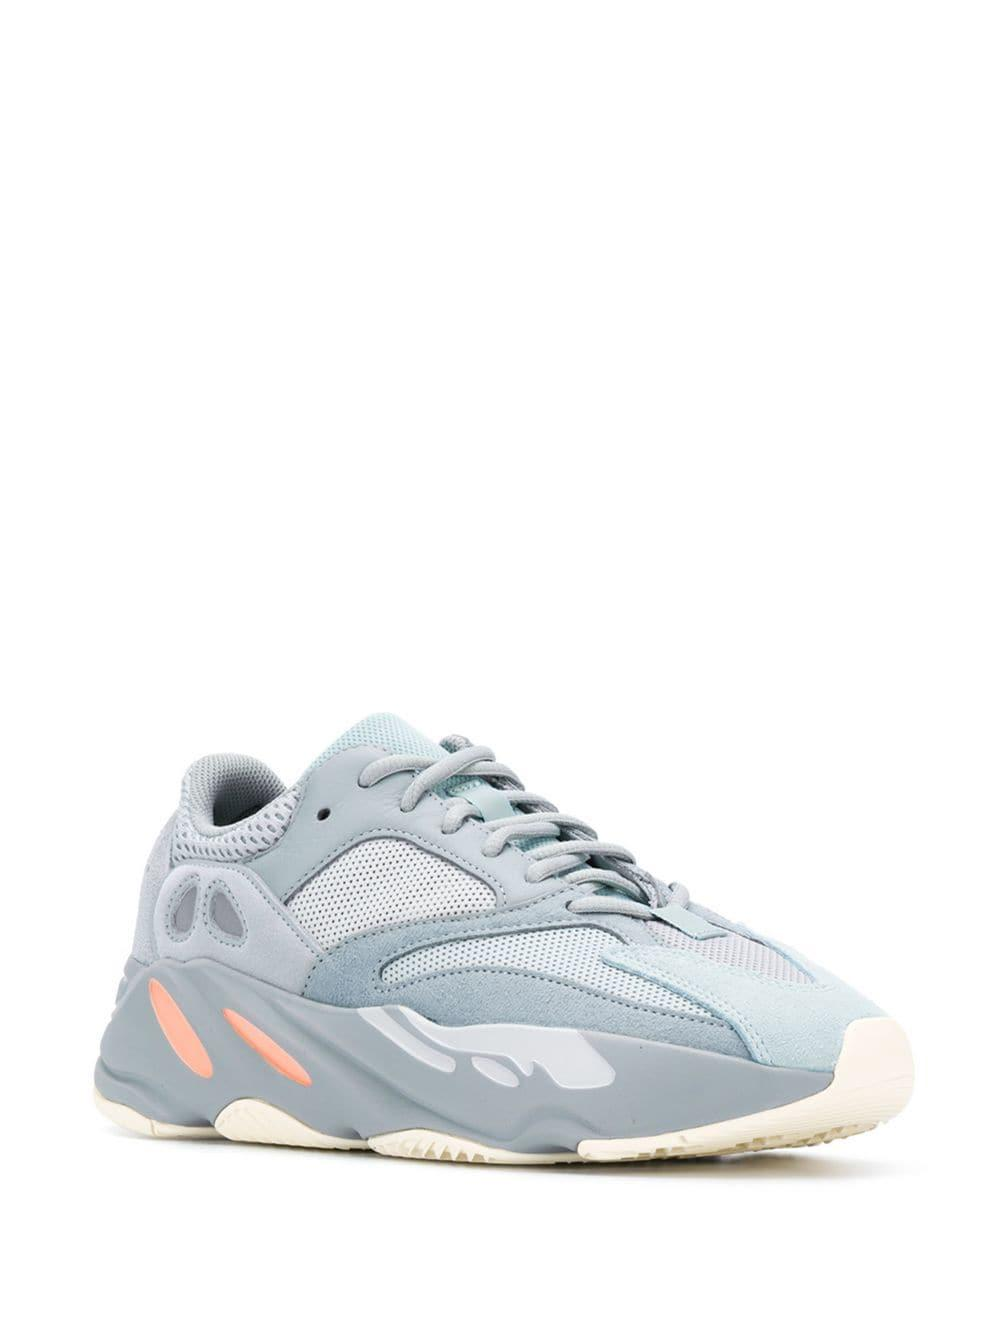 5e60efe46e013 Lyst - adidas X Yeezy Boost 700 Inertia Sneakers in Blue for Men